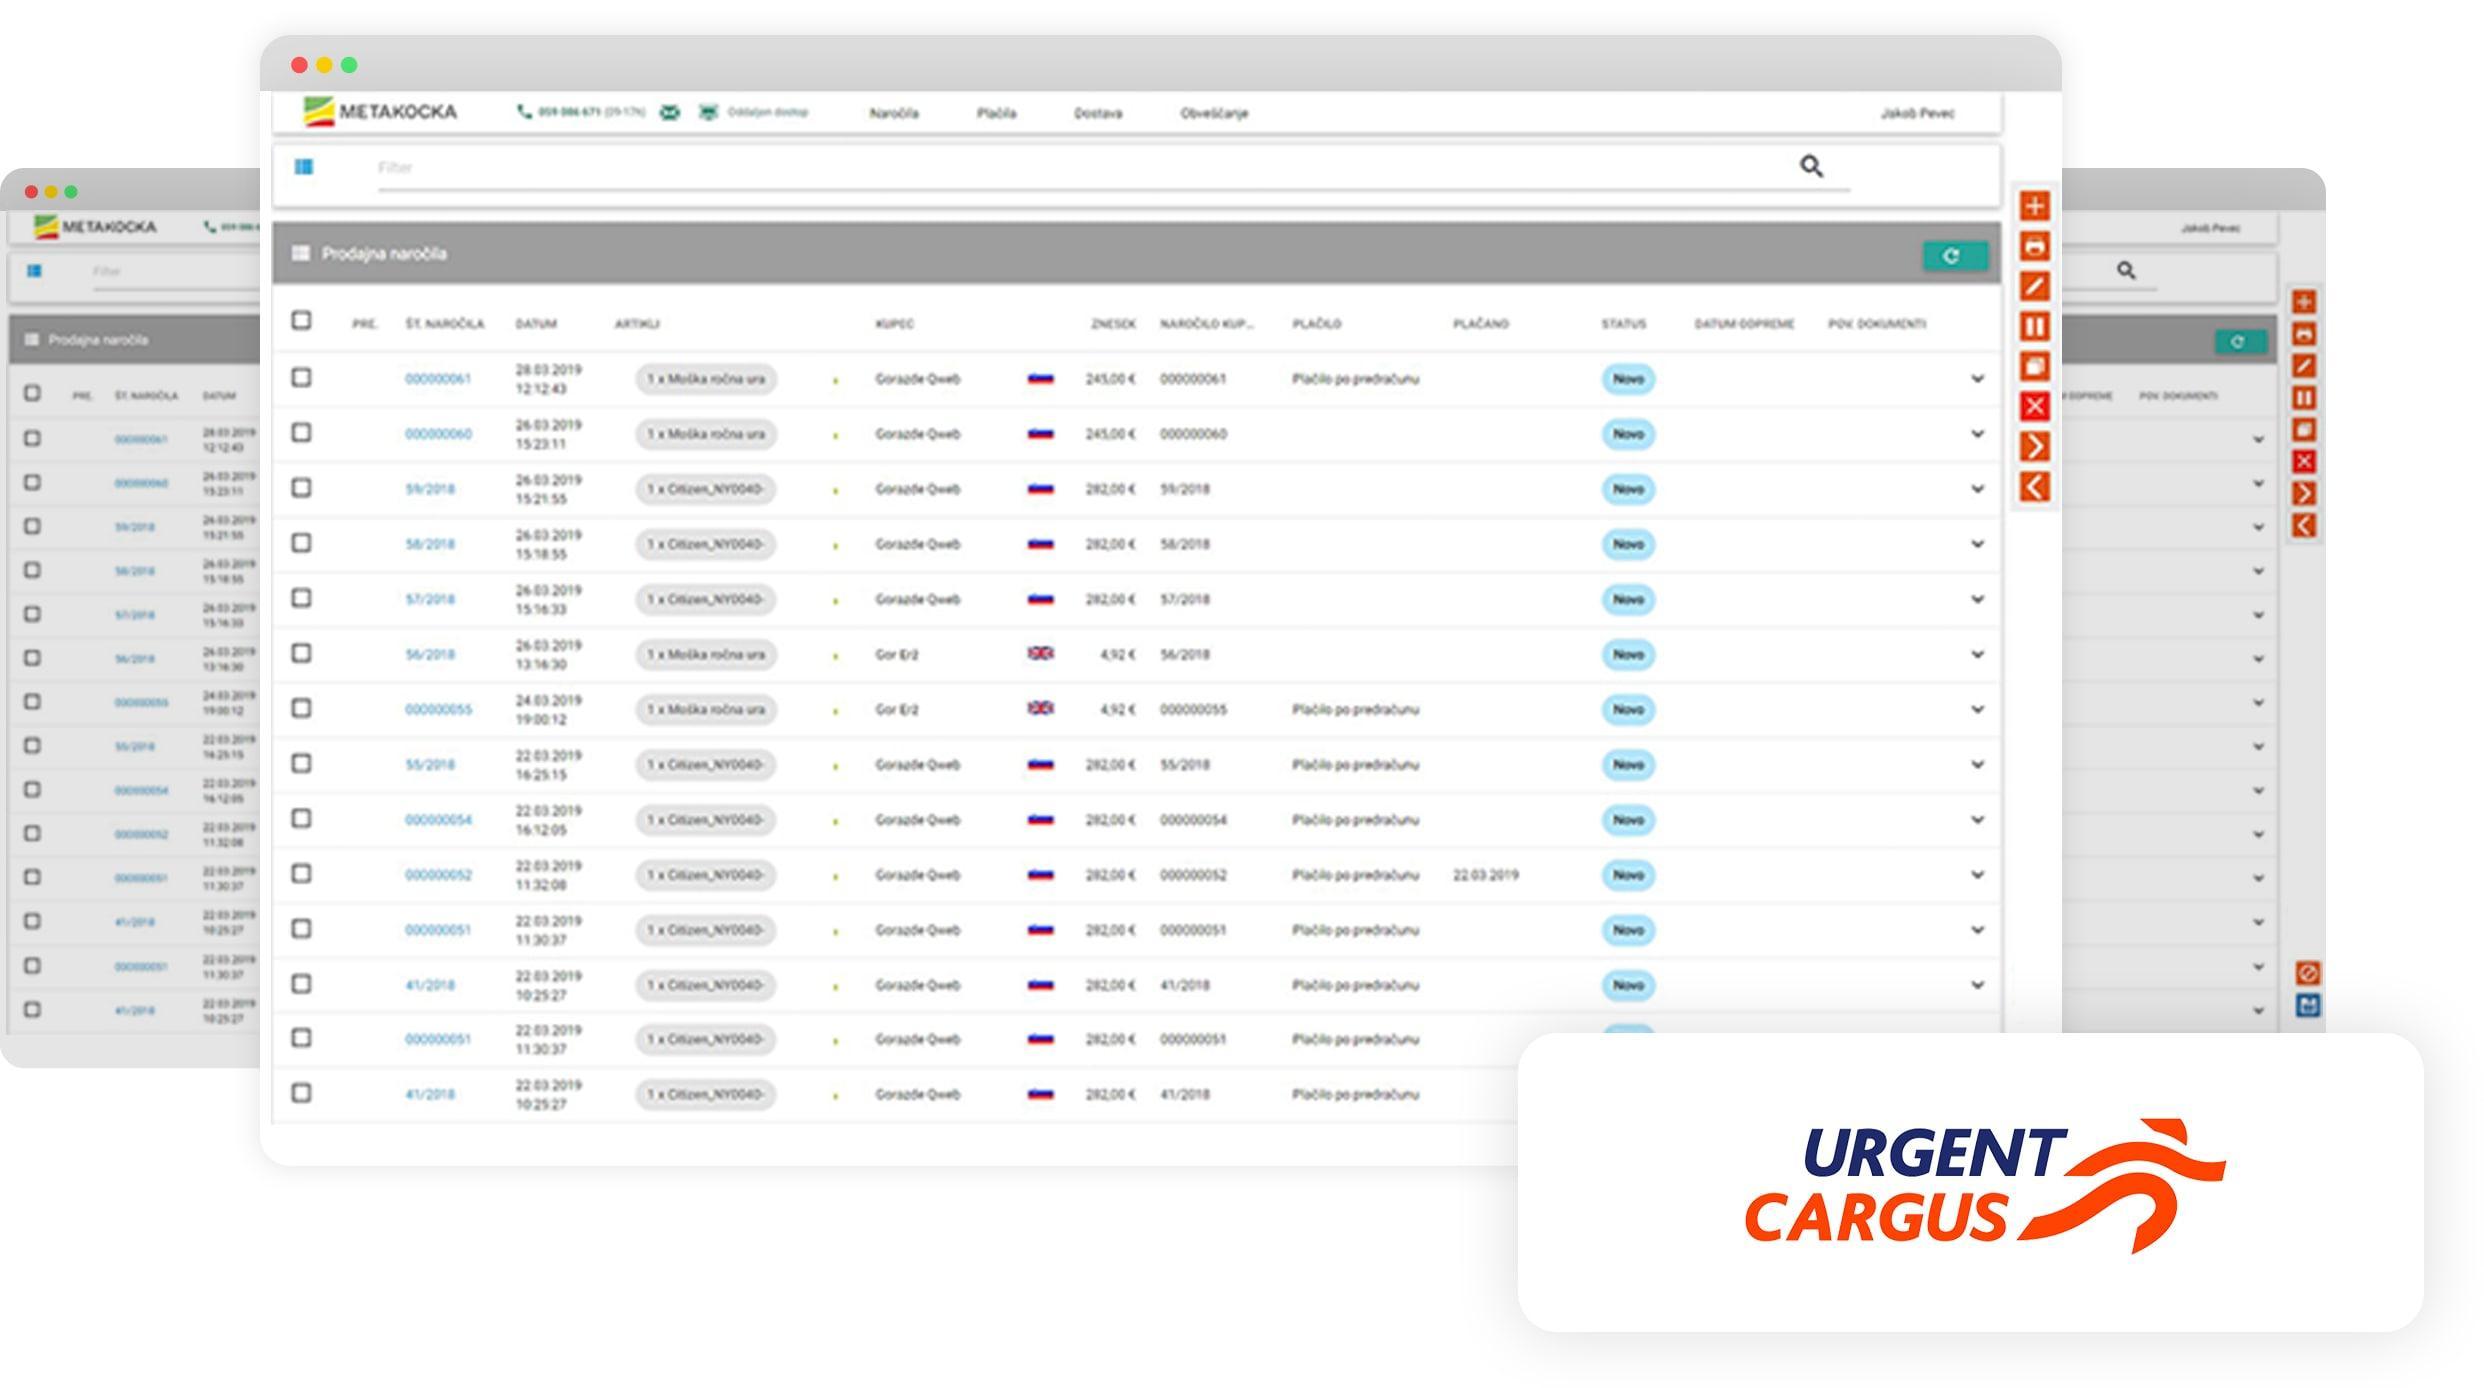 integracija_urgent_cargus